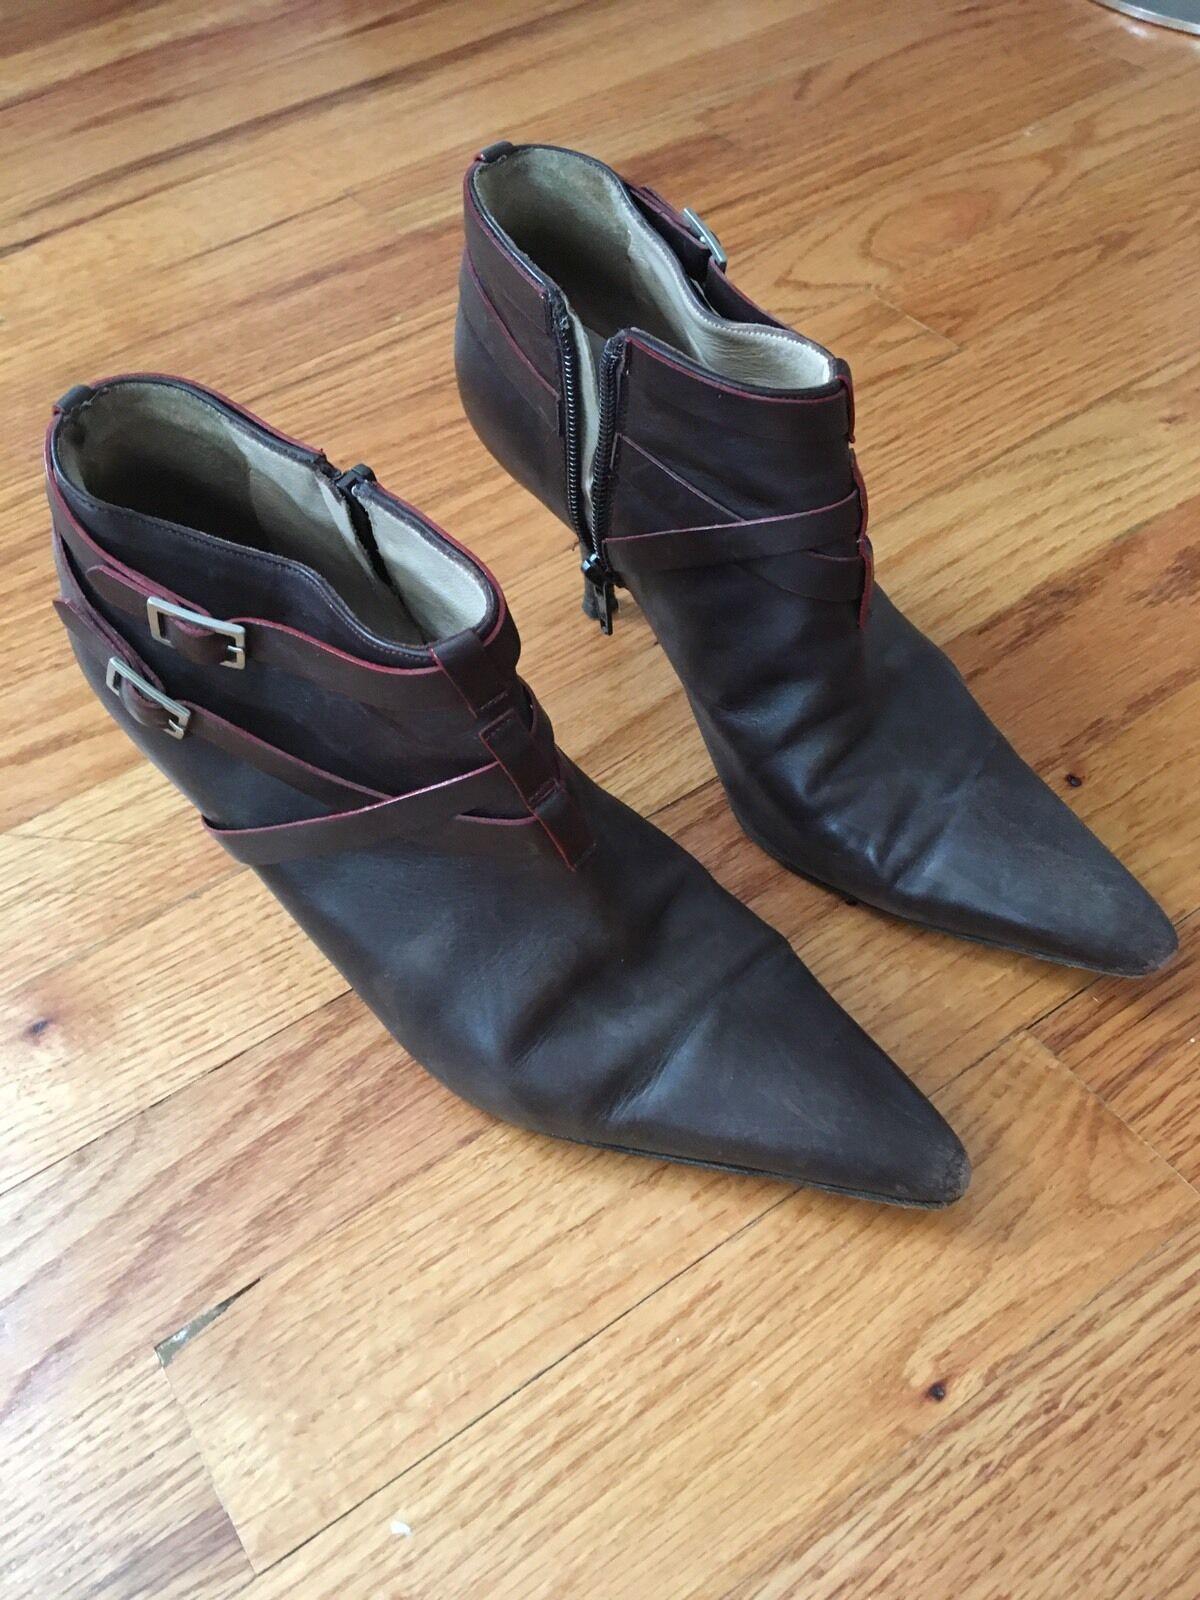 Authentic  Manolo Blahnik Boots Booties Size 37